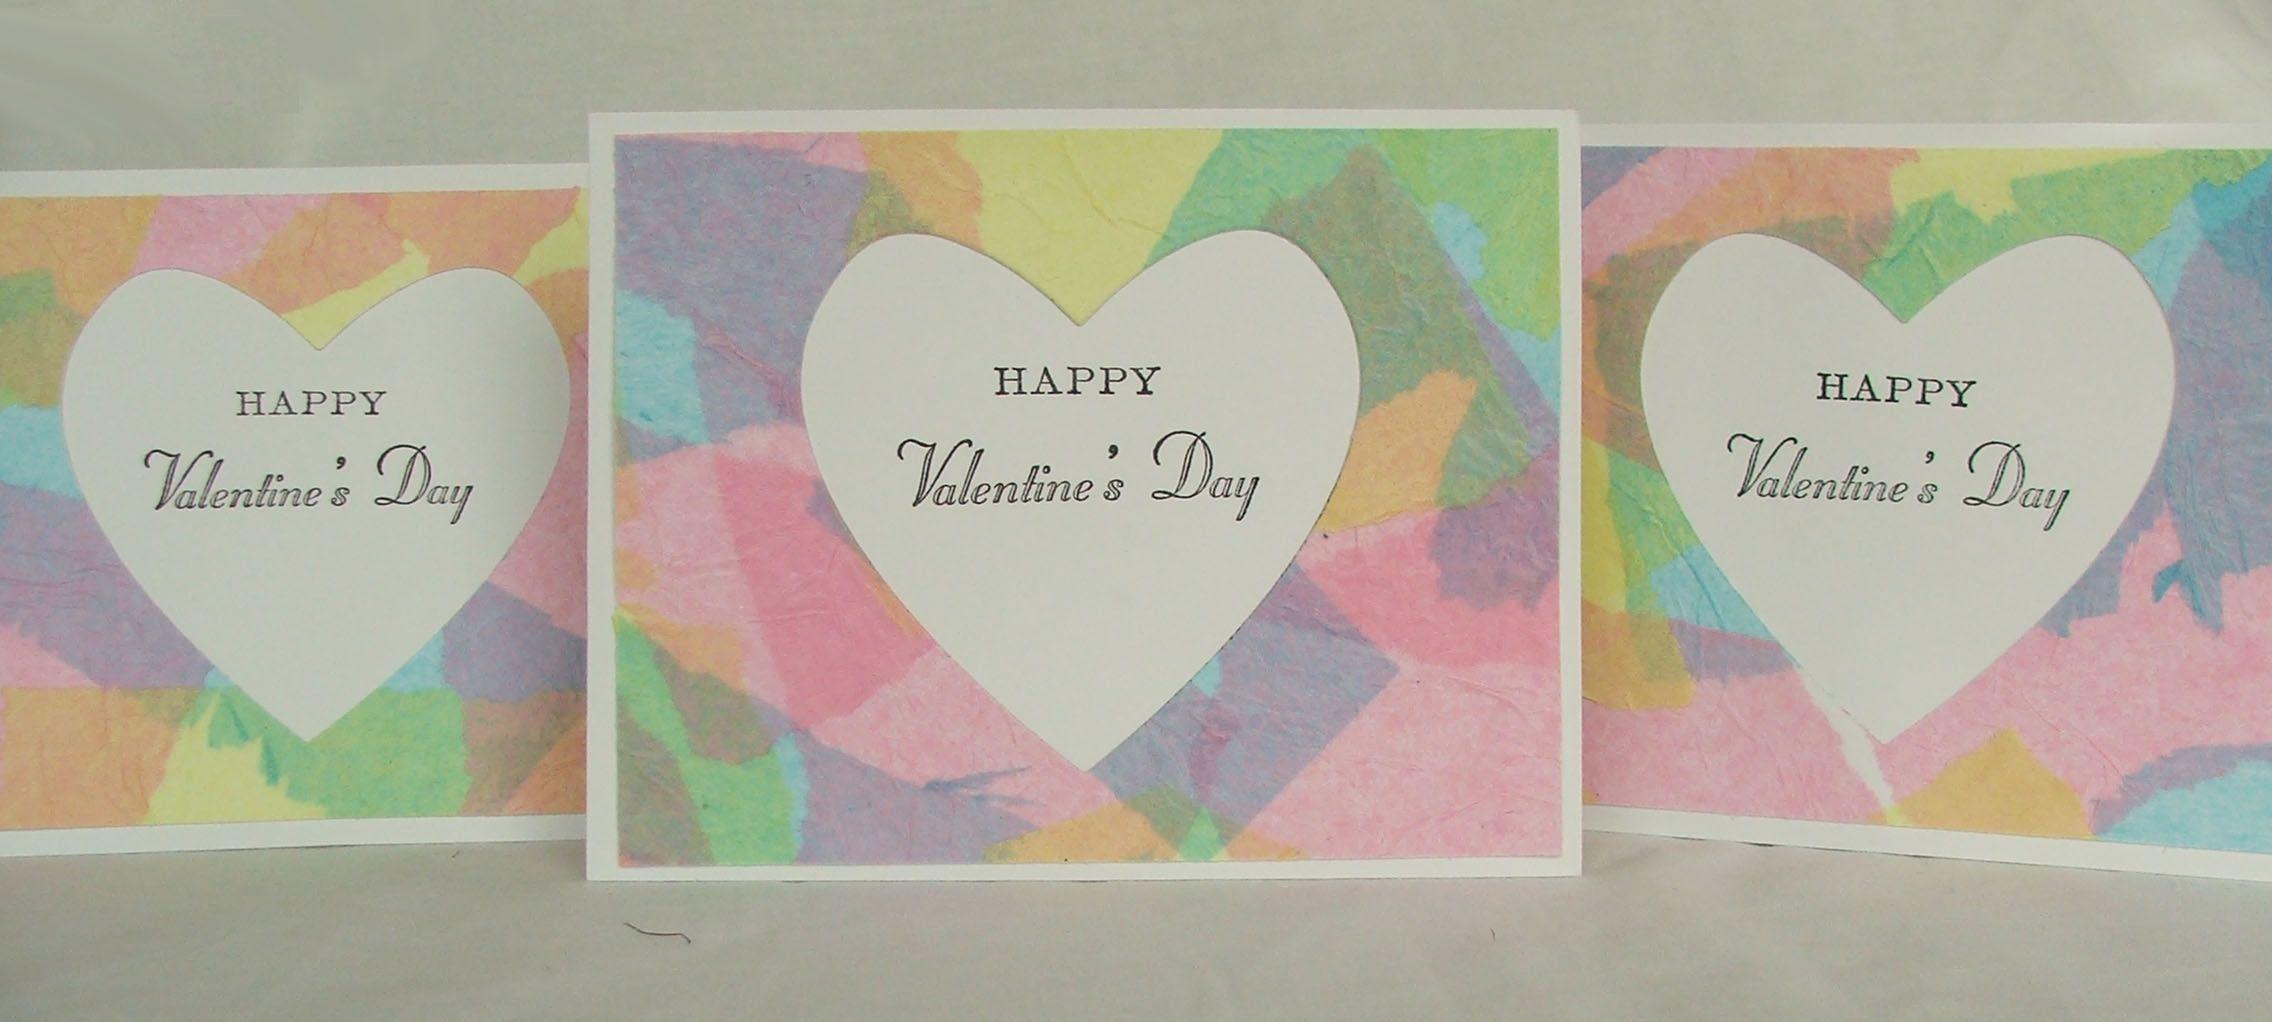 valentine photo collage free